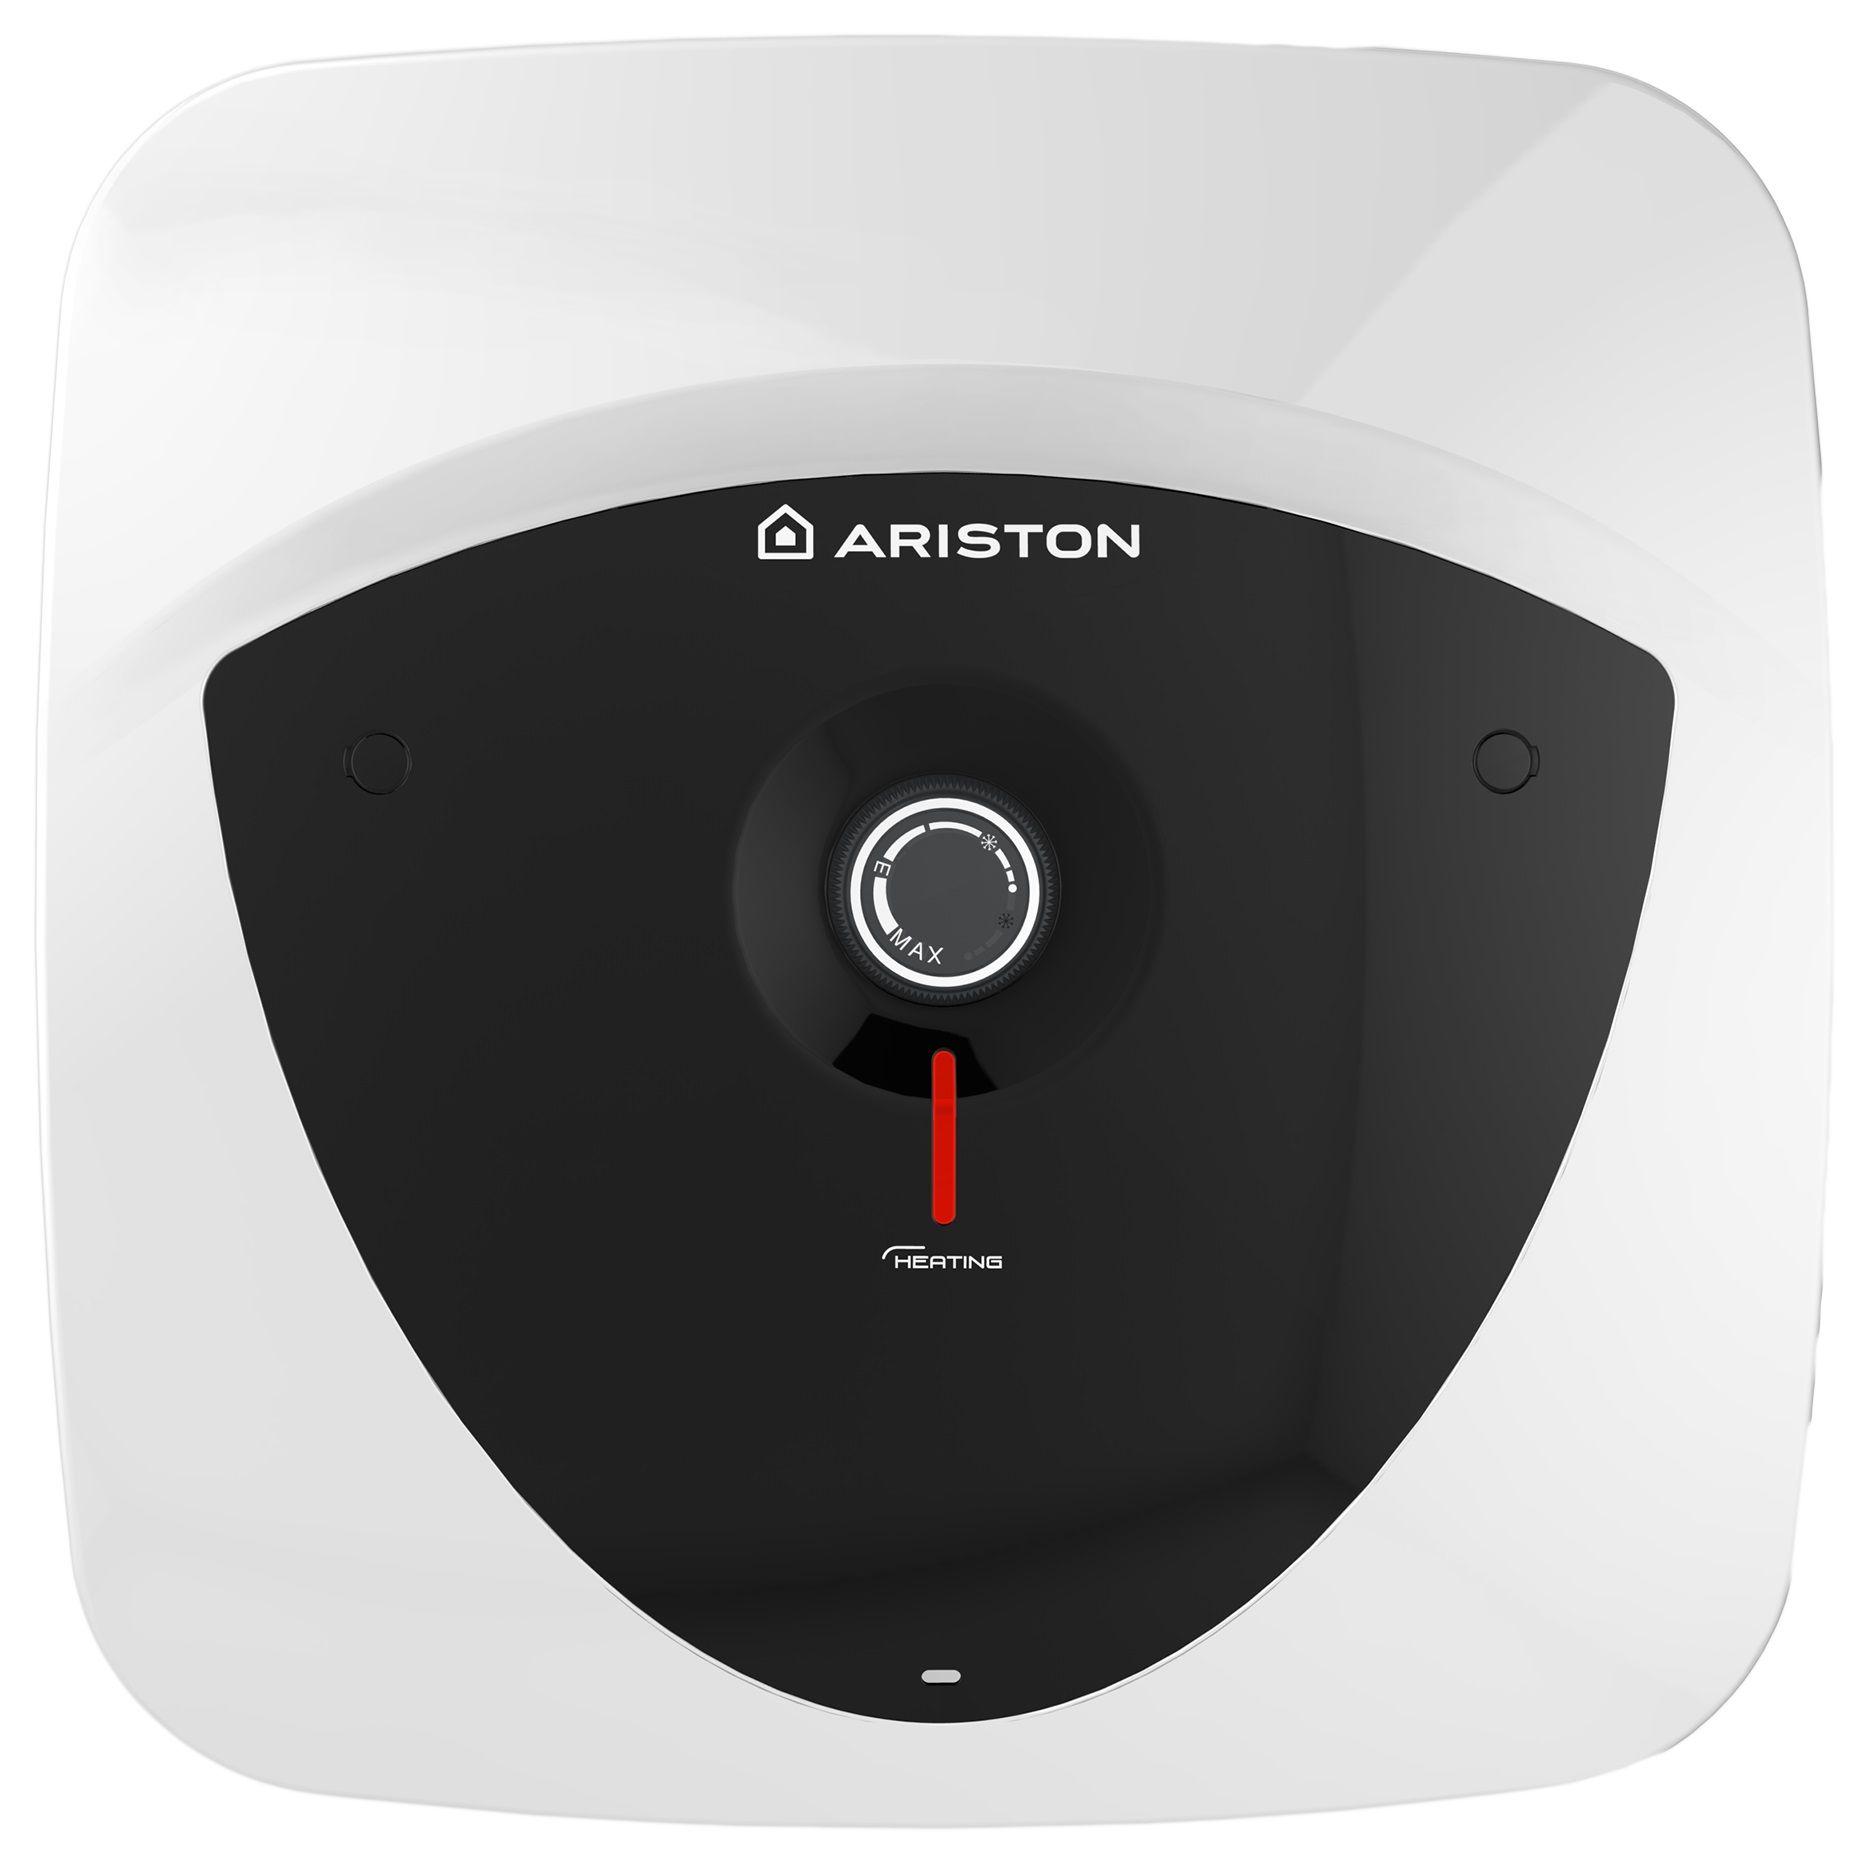 Boiler electric Ariston Andris LUX 15 EU, 15 l, 1200 W, Led iluminat, Protectie electrica IPX5, Montare deasupra chiuvetei, Reglaj extern de temperatura imagine fornello.ro